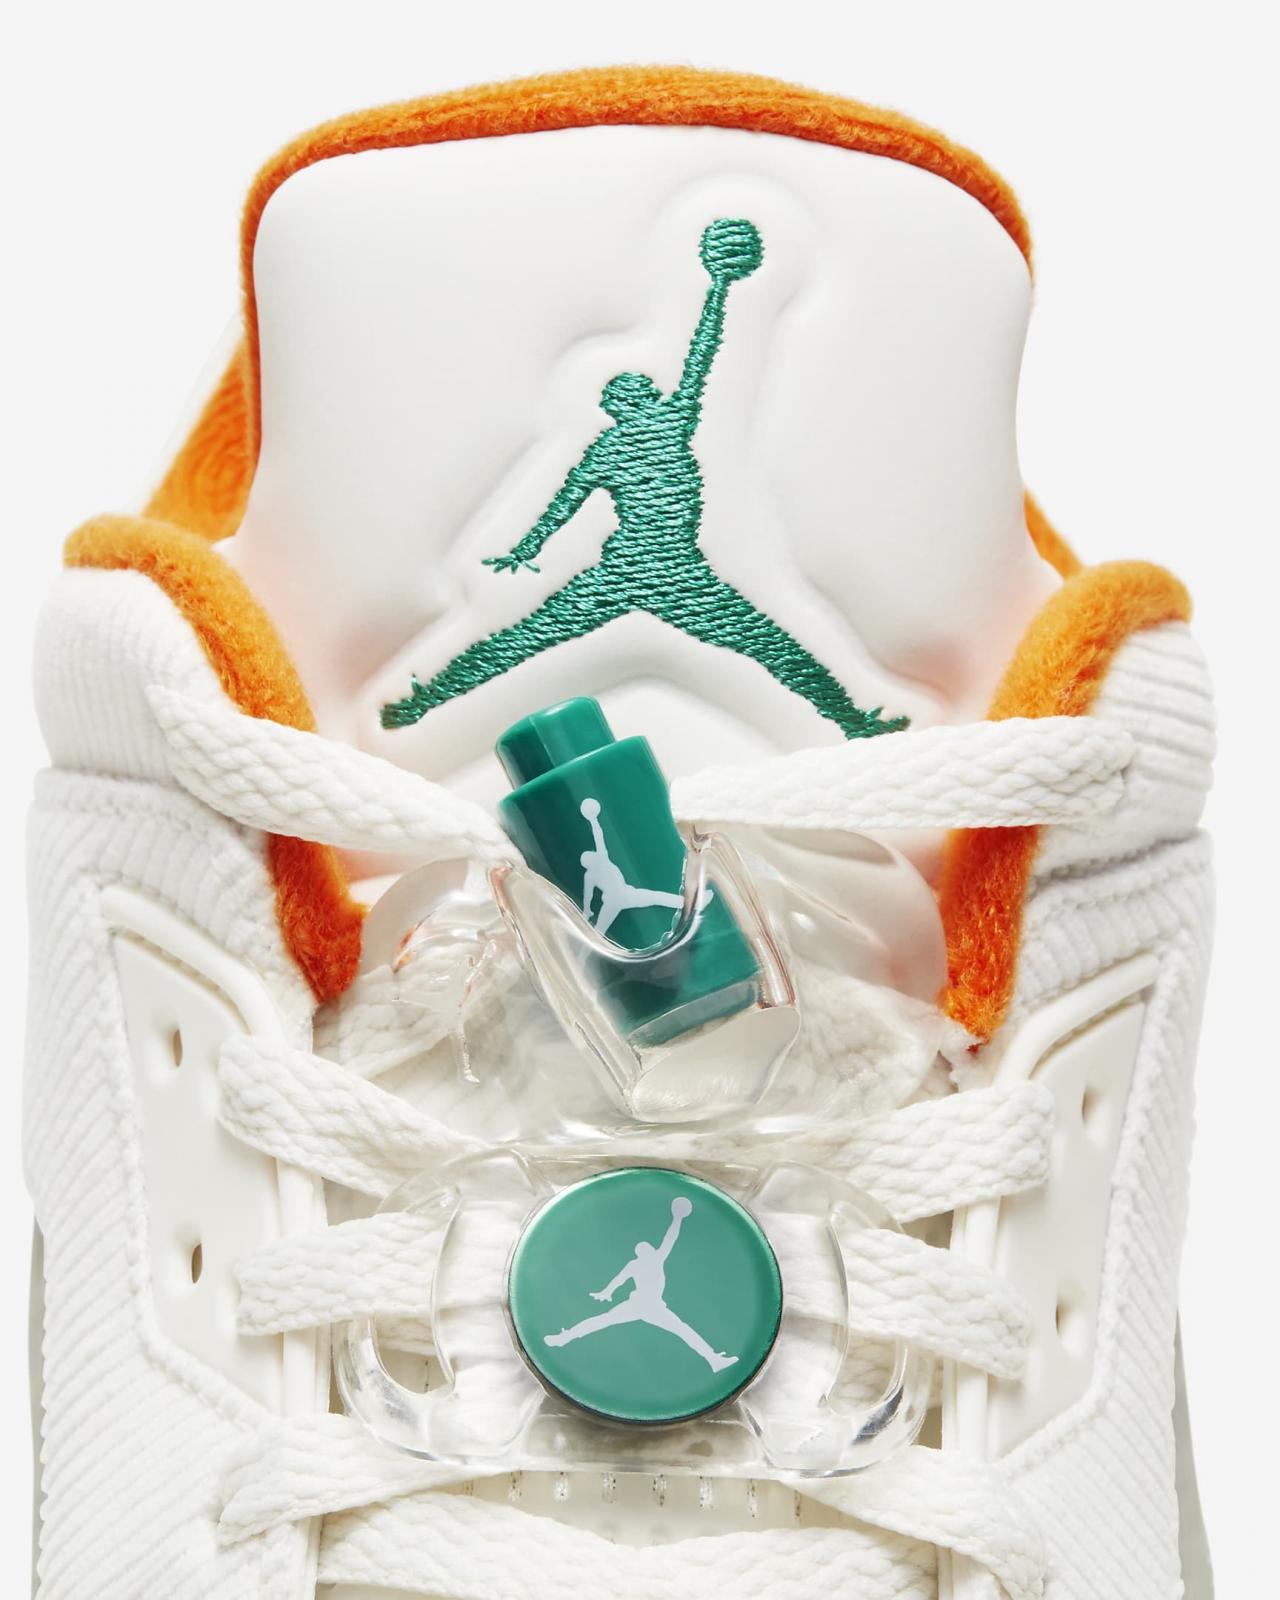 Jordan品牌发布全新帆白/海星橙/海神绿/黑曜石色Jordan 5 Low G